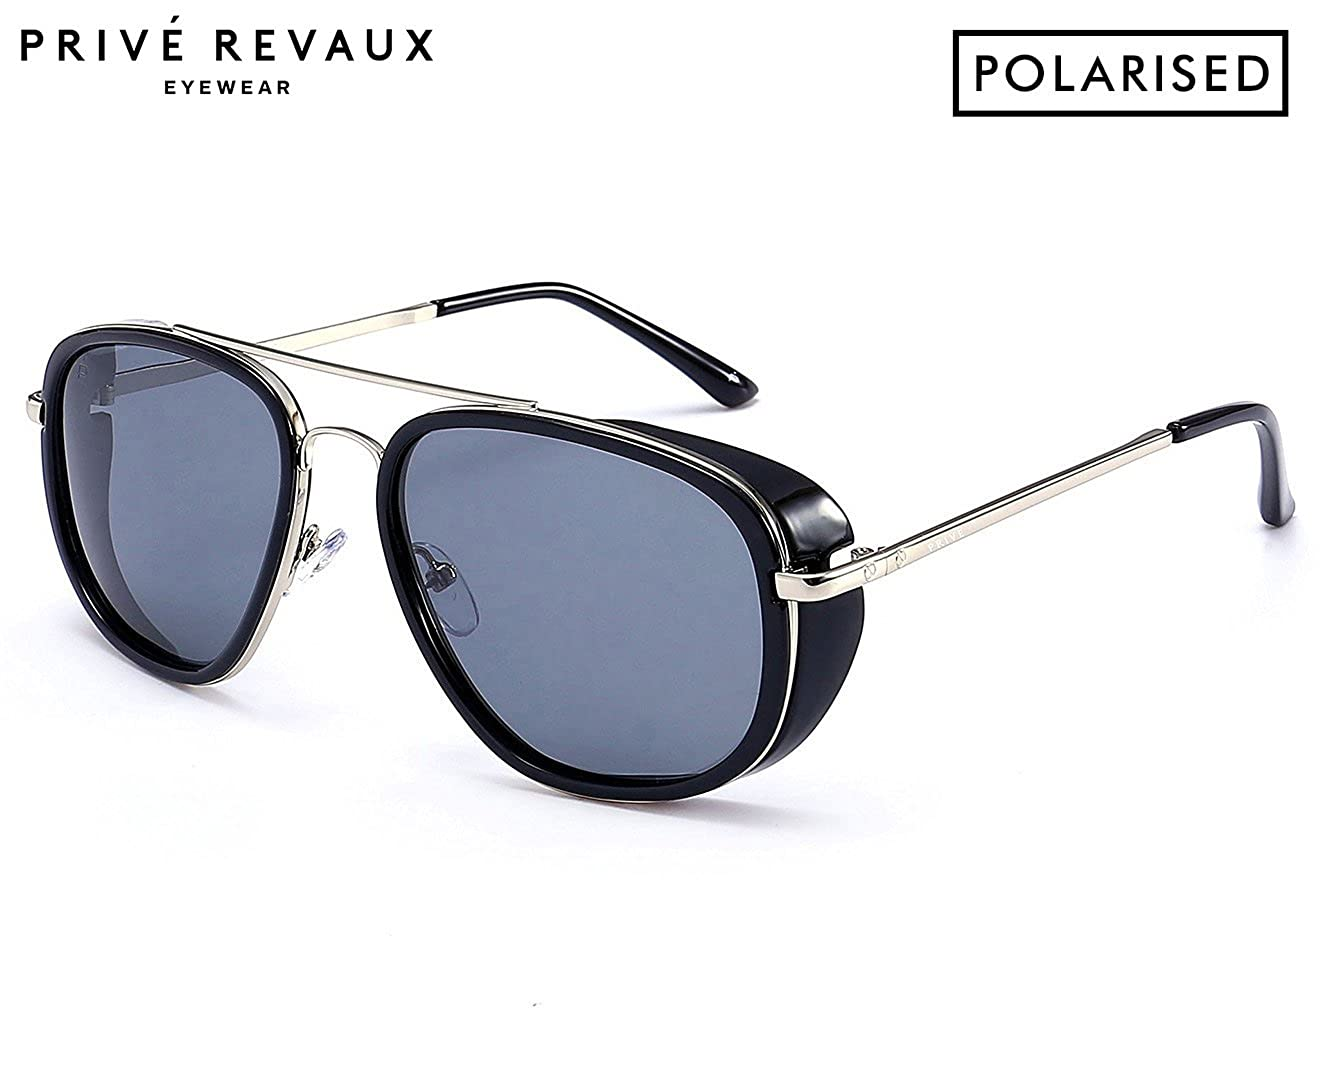 "6c0076d1f8 Amazon.com  PRIVÉ REVAUX ""The Explorer"" Handcrafted Designer Rider Polarized  Sunglasses For Men   Women  Clothing"